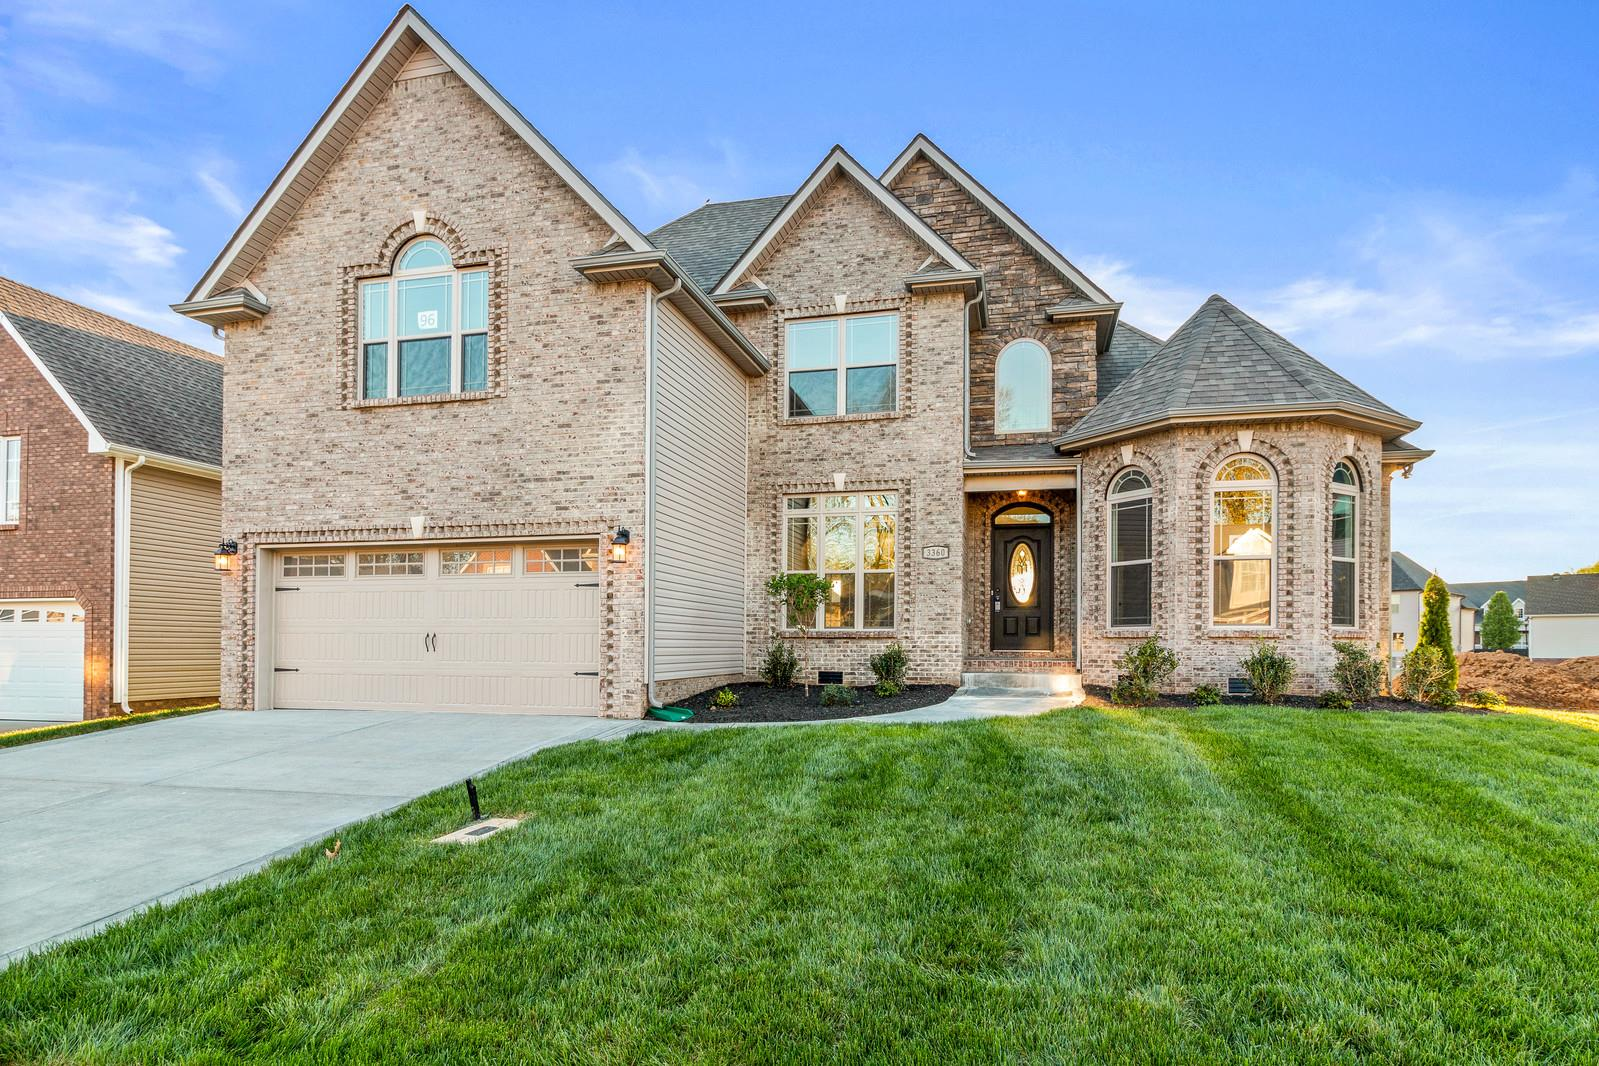 2400 Colston Dr, Clarksville, TN 37042 - Clarksville, TN real estate listing